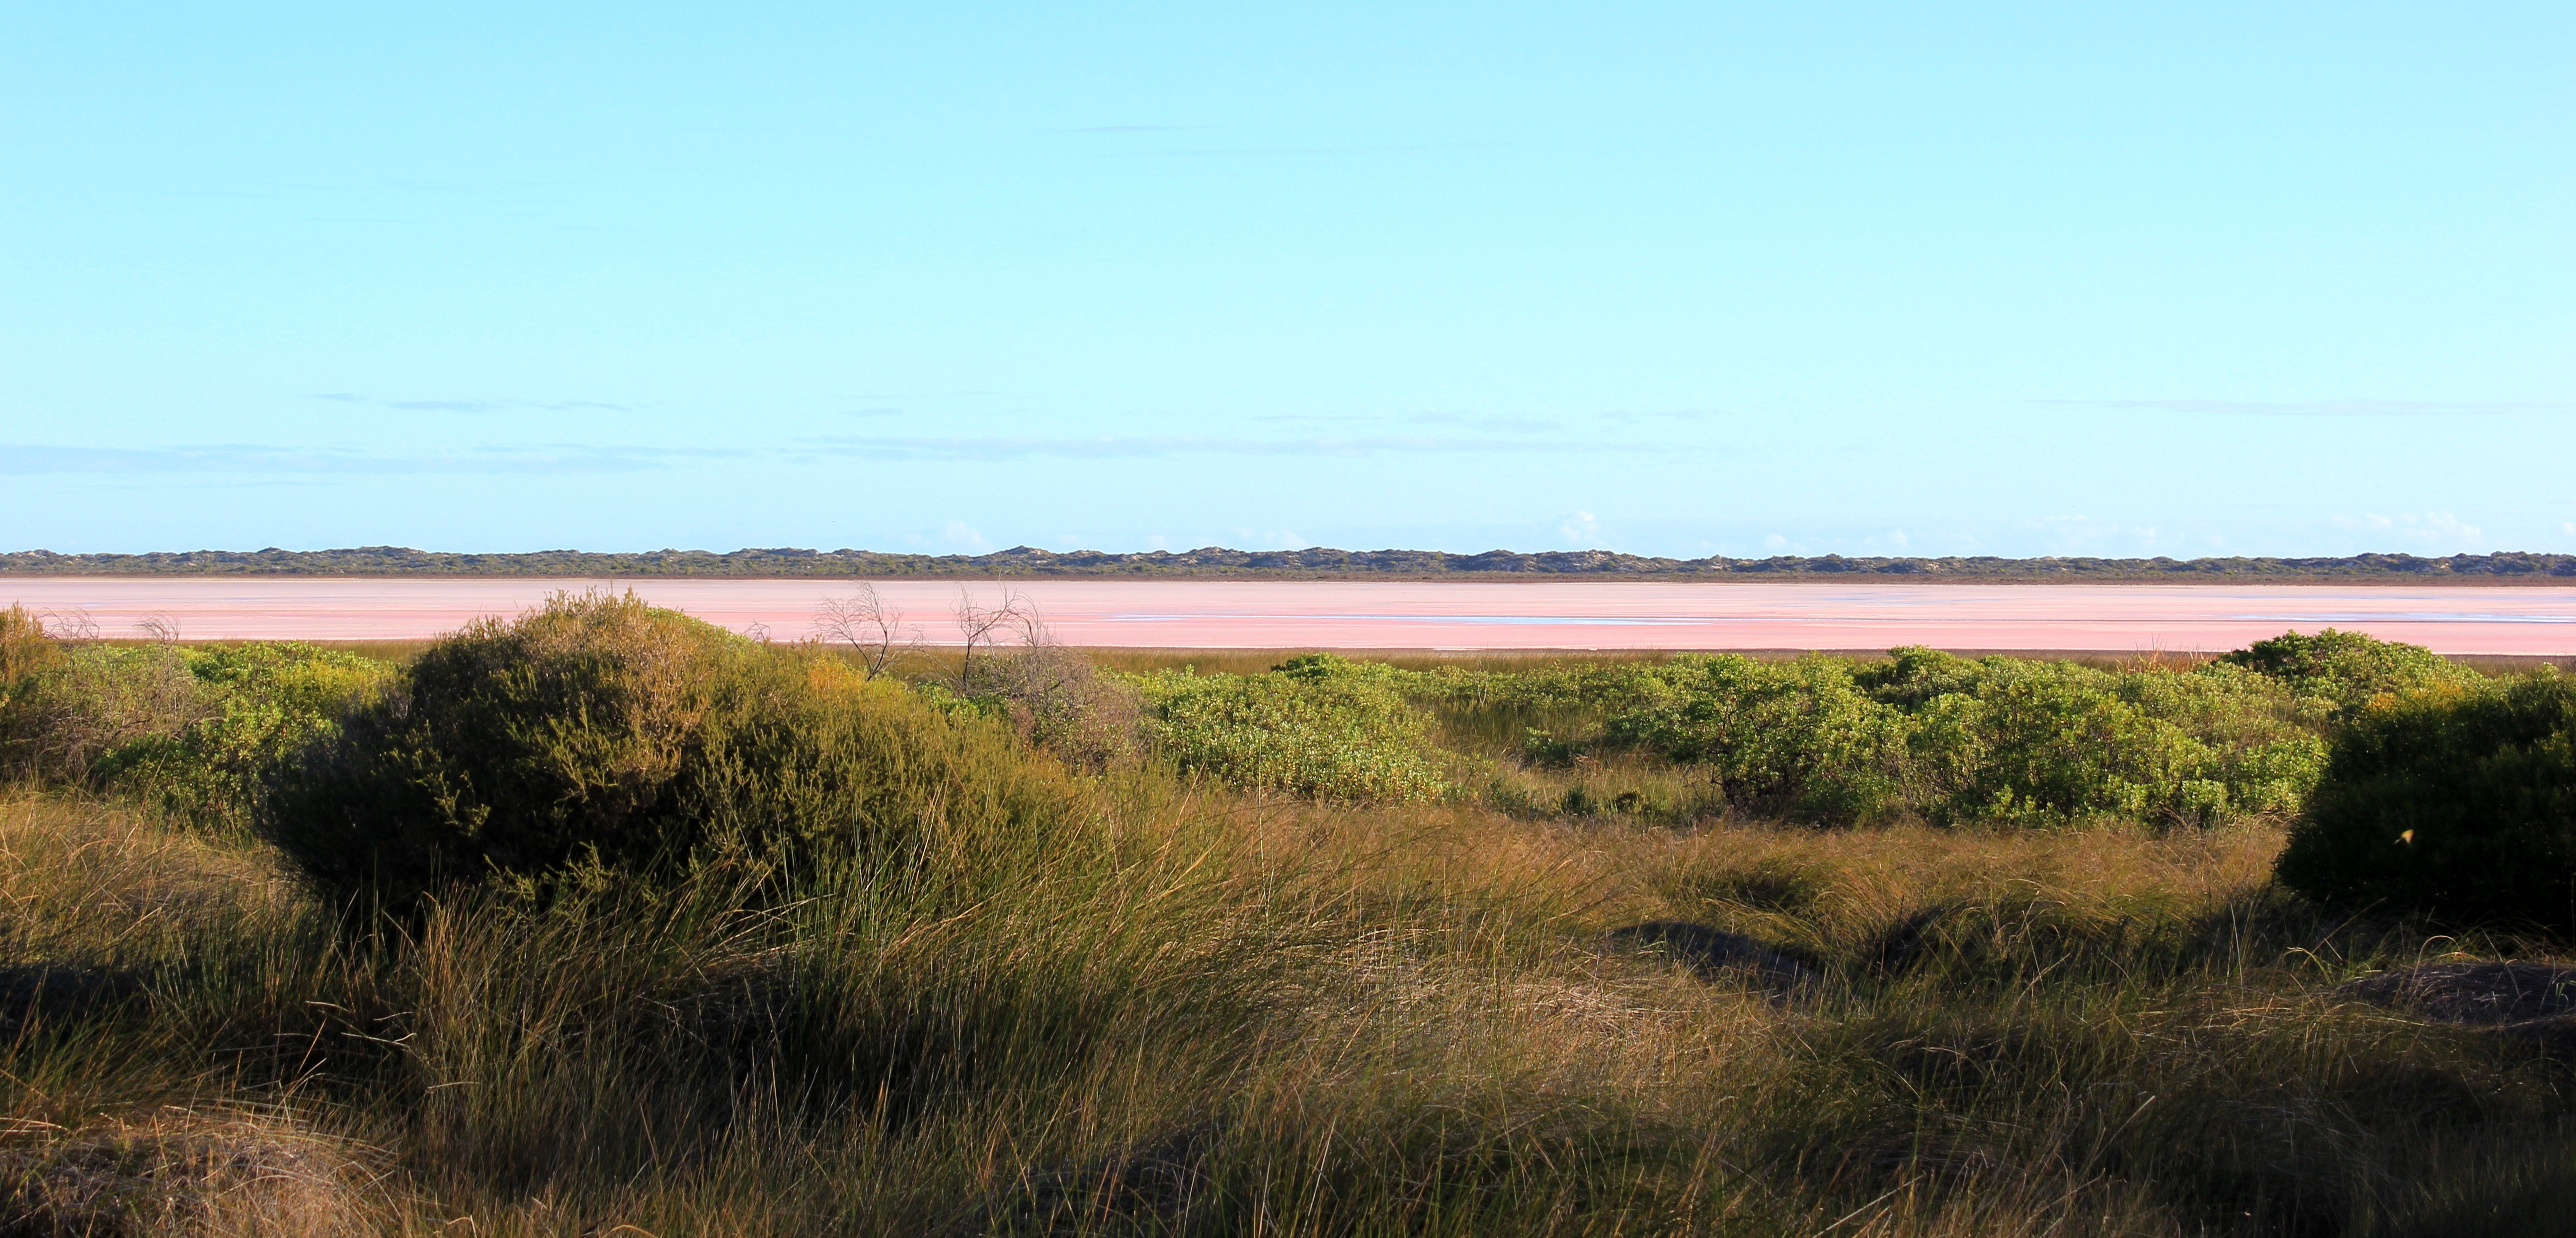 Voyages-et-compagnie.com - Blog voyage | Côte Ouest Australie - Port Gregory, Pink Lake